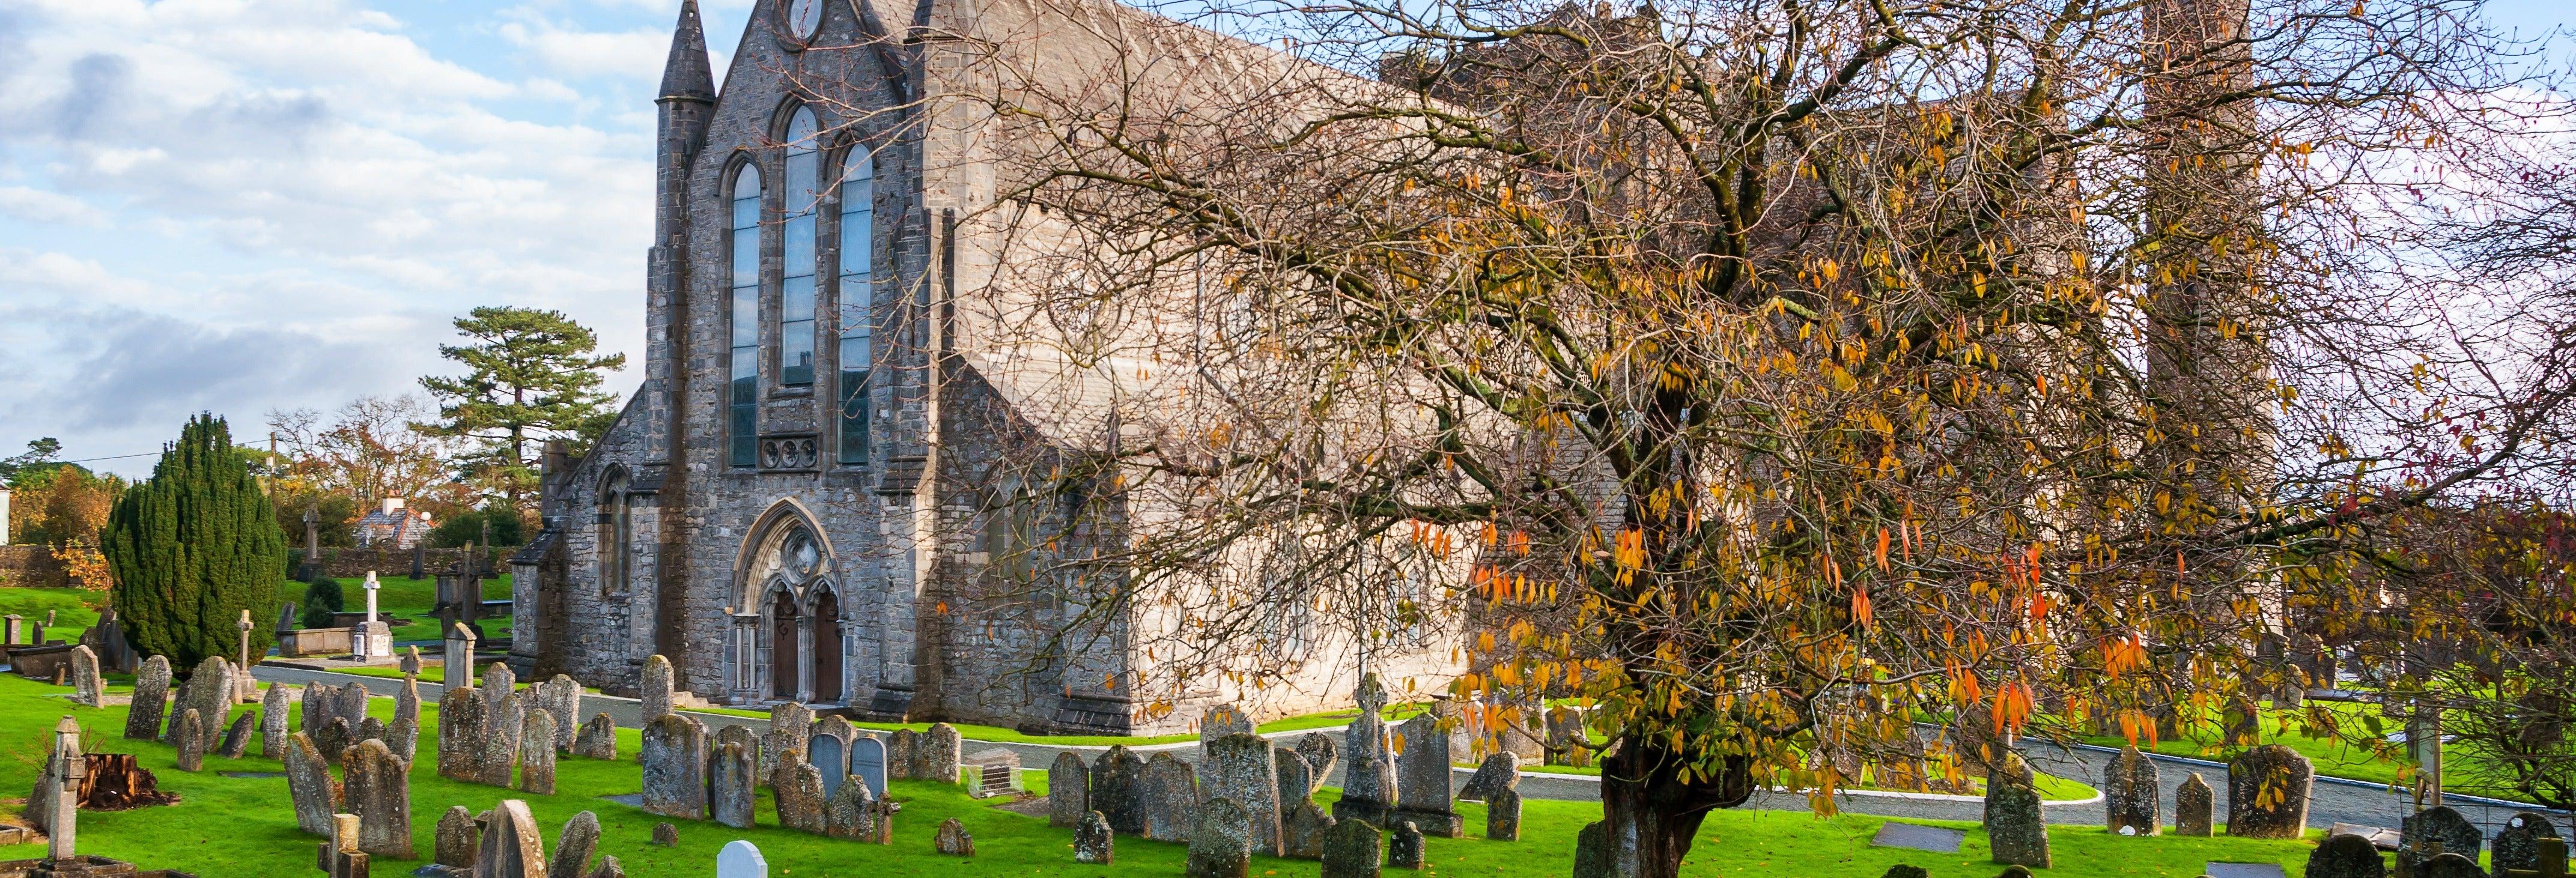 Visita guiada por Kilkenny